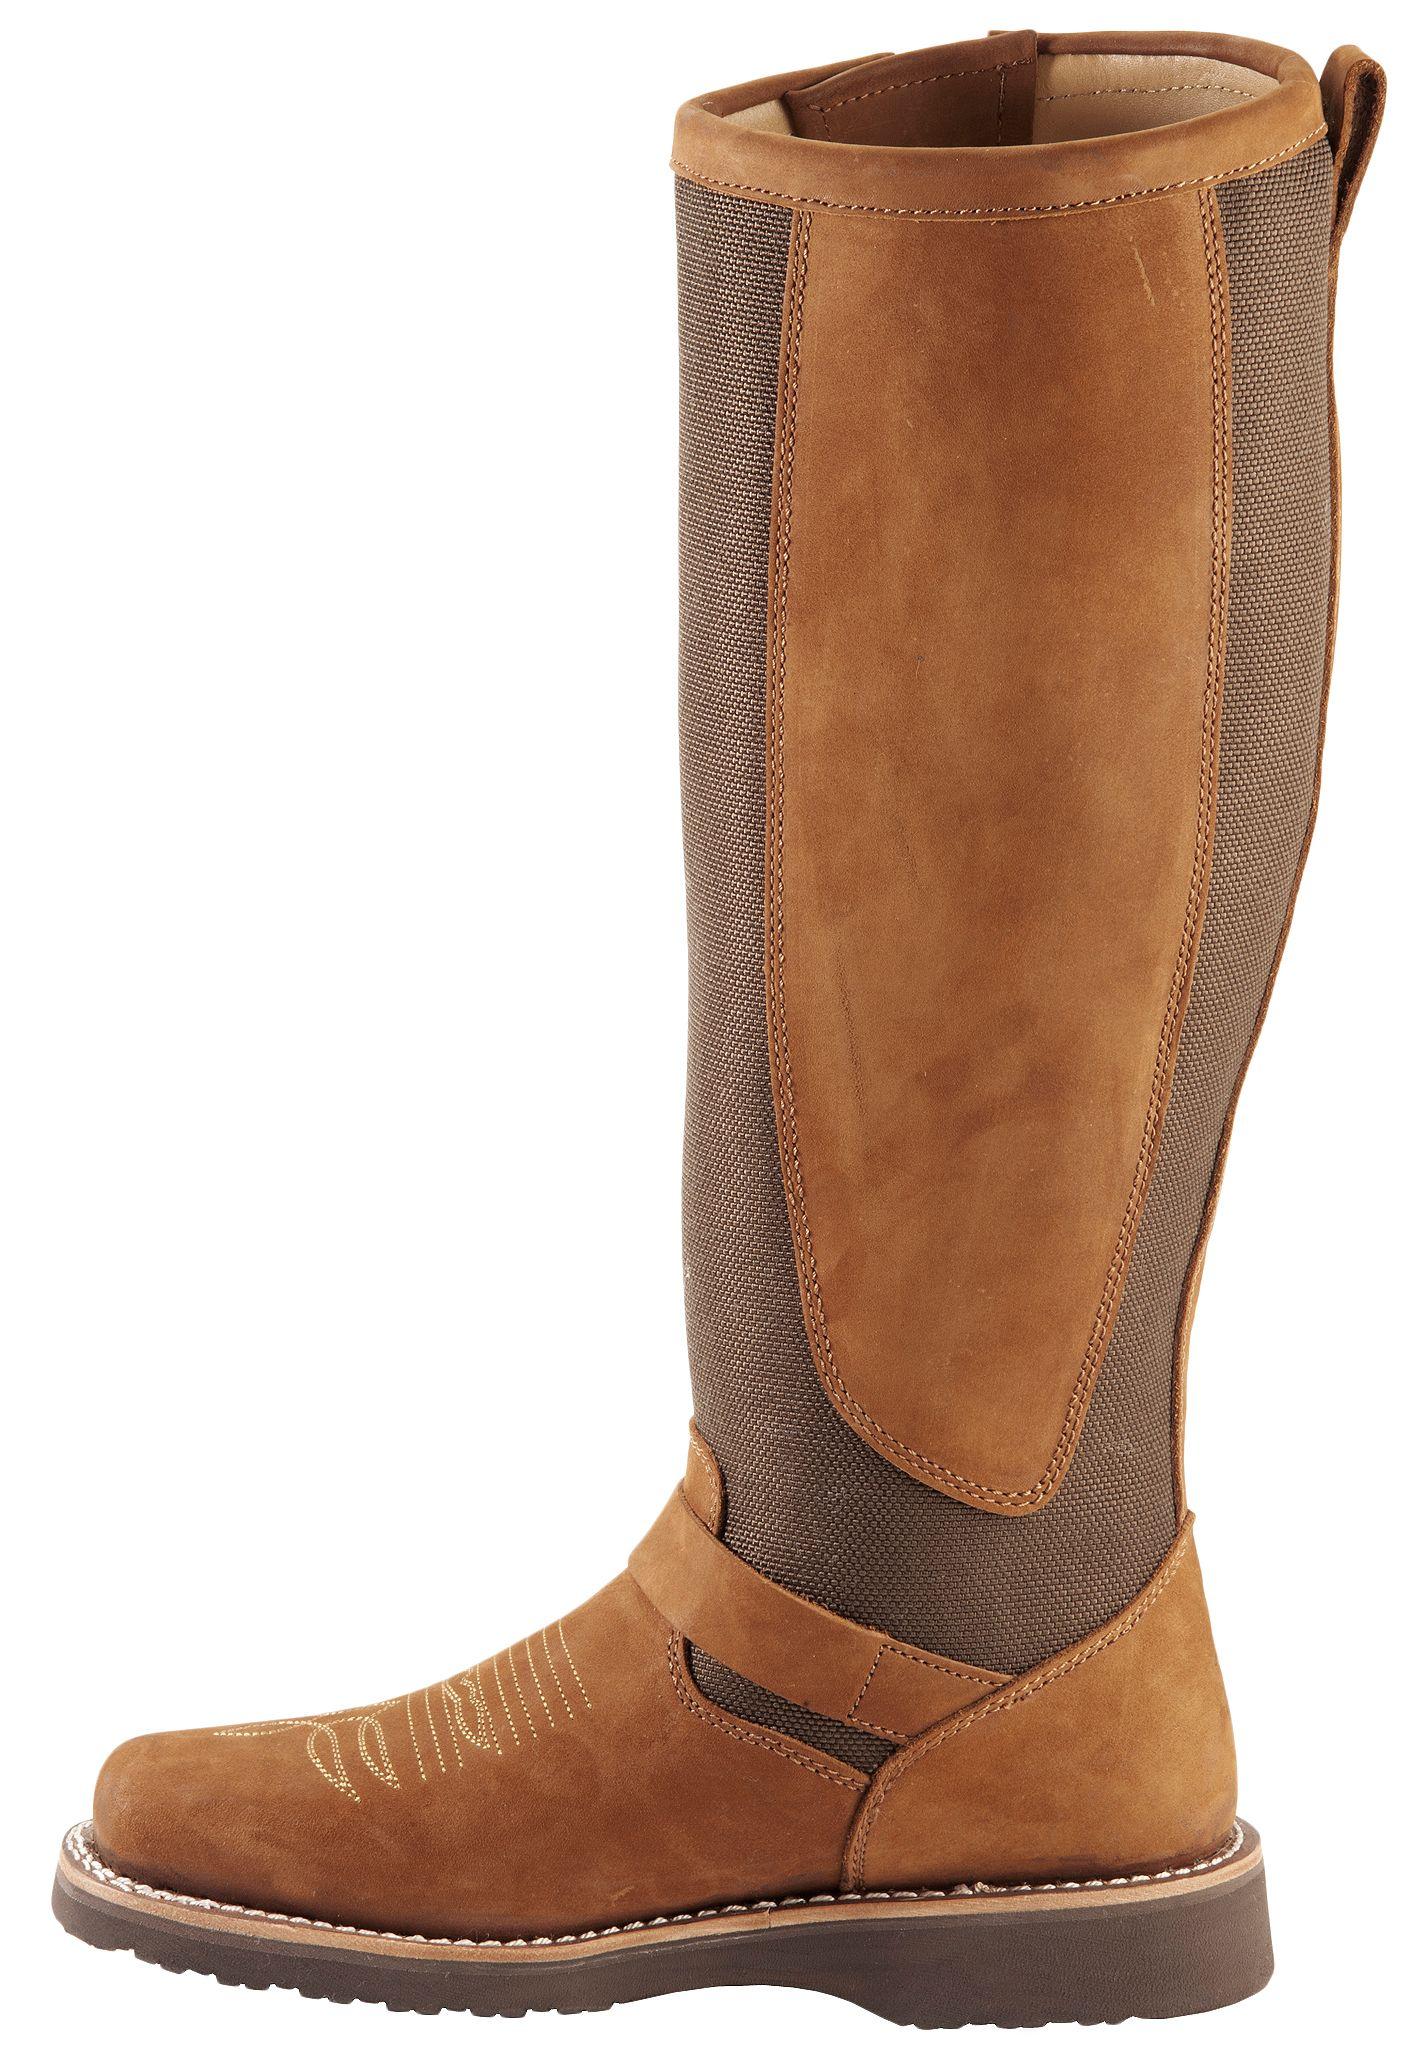 Chippewa Aged Regina Snake Boots Square Toe Sheplers